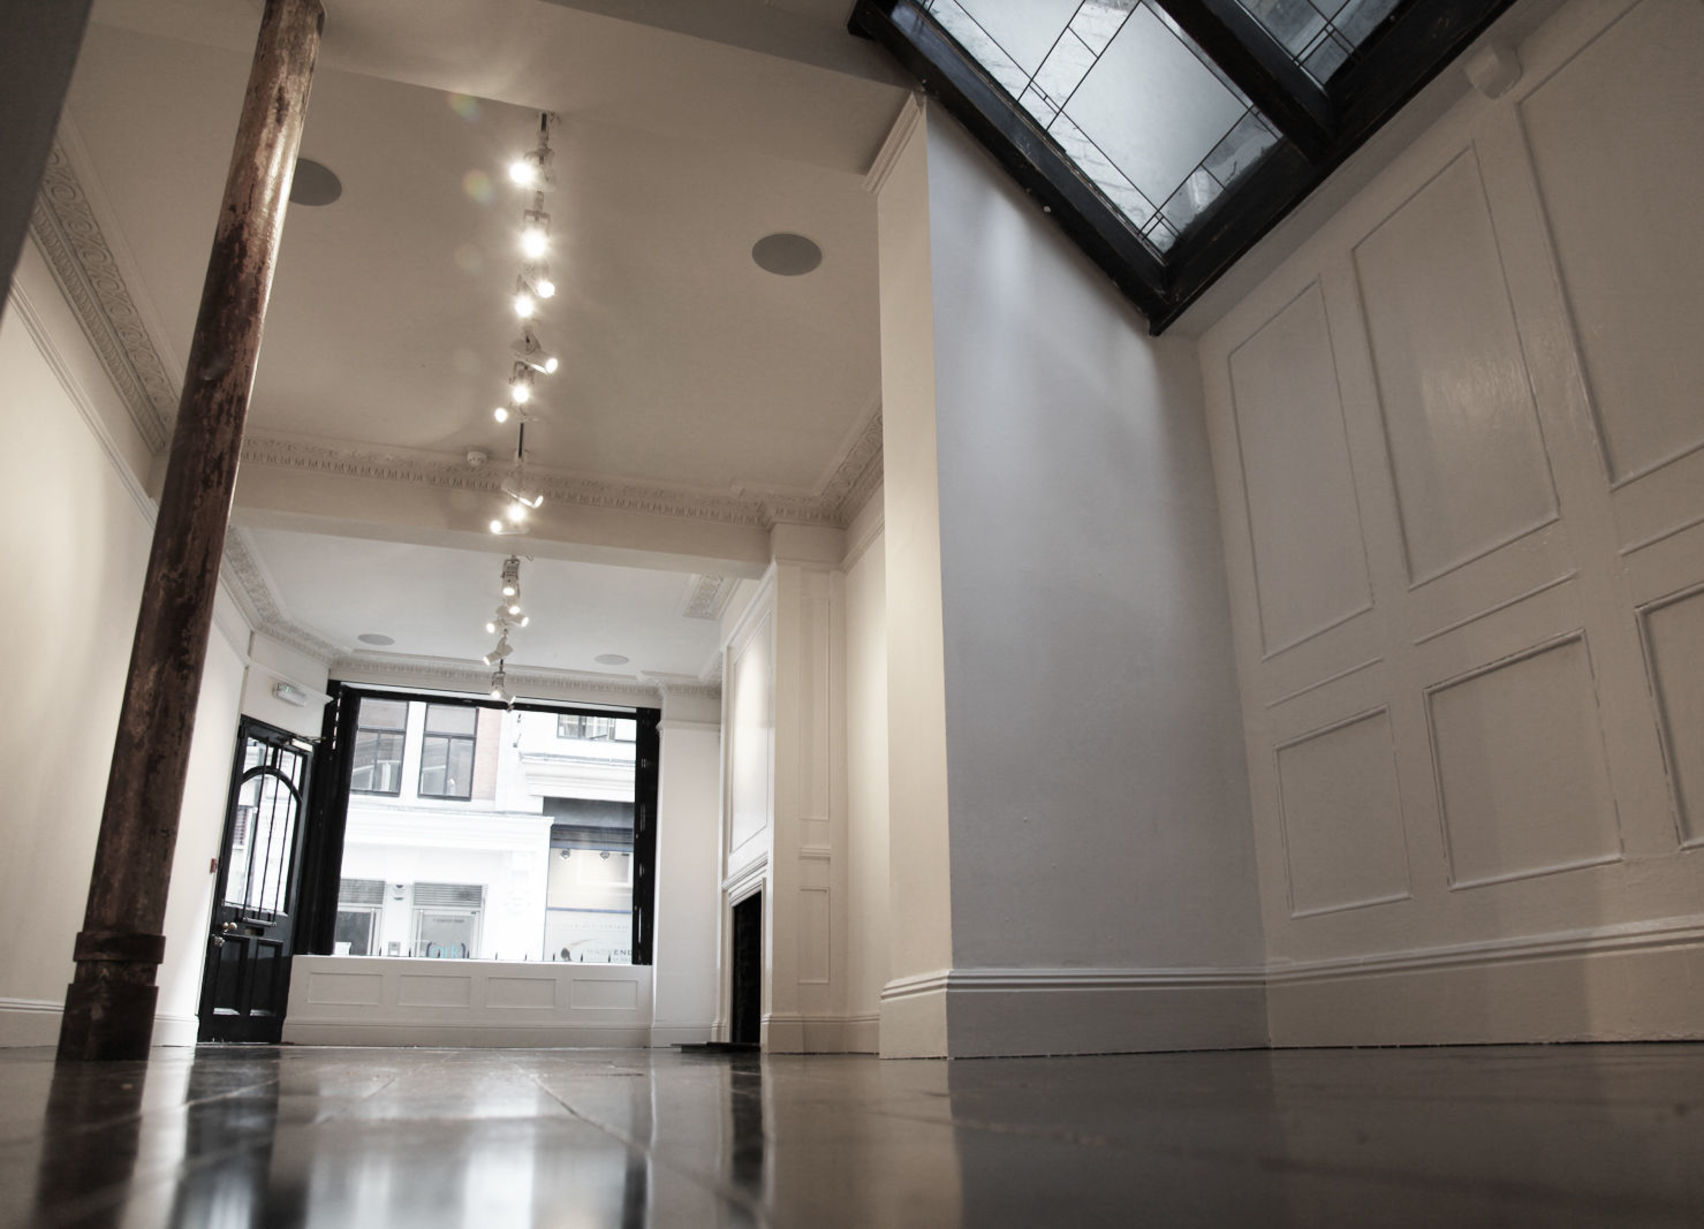 15 Bateman Street, 15 Bateman Street Gallery